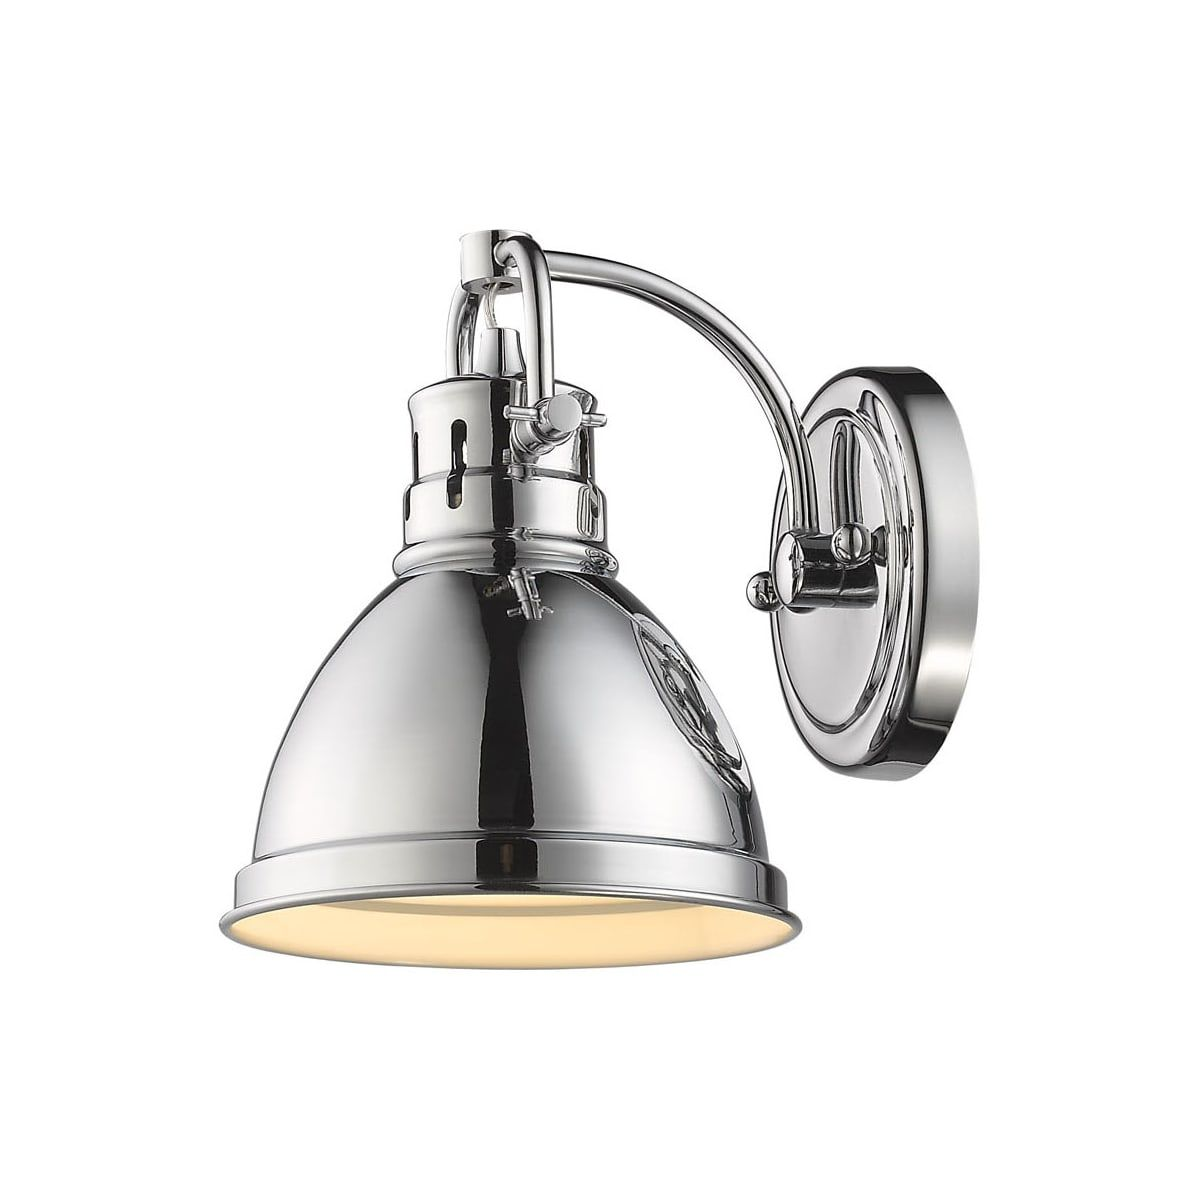 Golden Lighting 3602 Ba1 Ch Ch Chrome Duncan Single Light 9 Tall Bathroom Sconce Golden Lighting Bathroom Sconces Wall Sconce Lighting